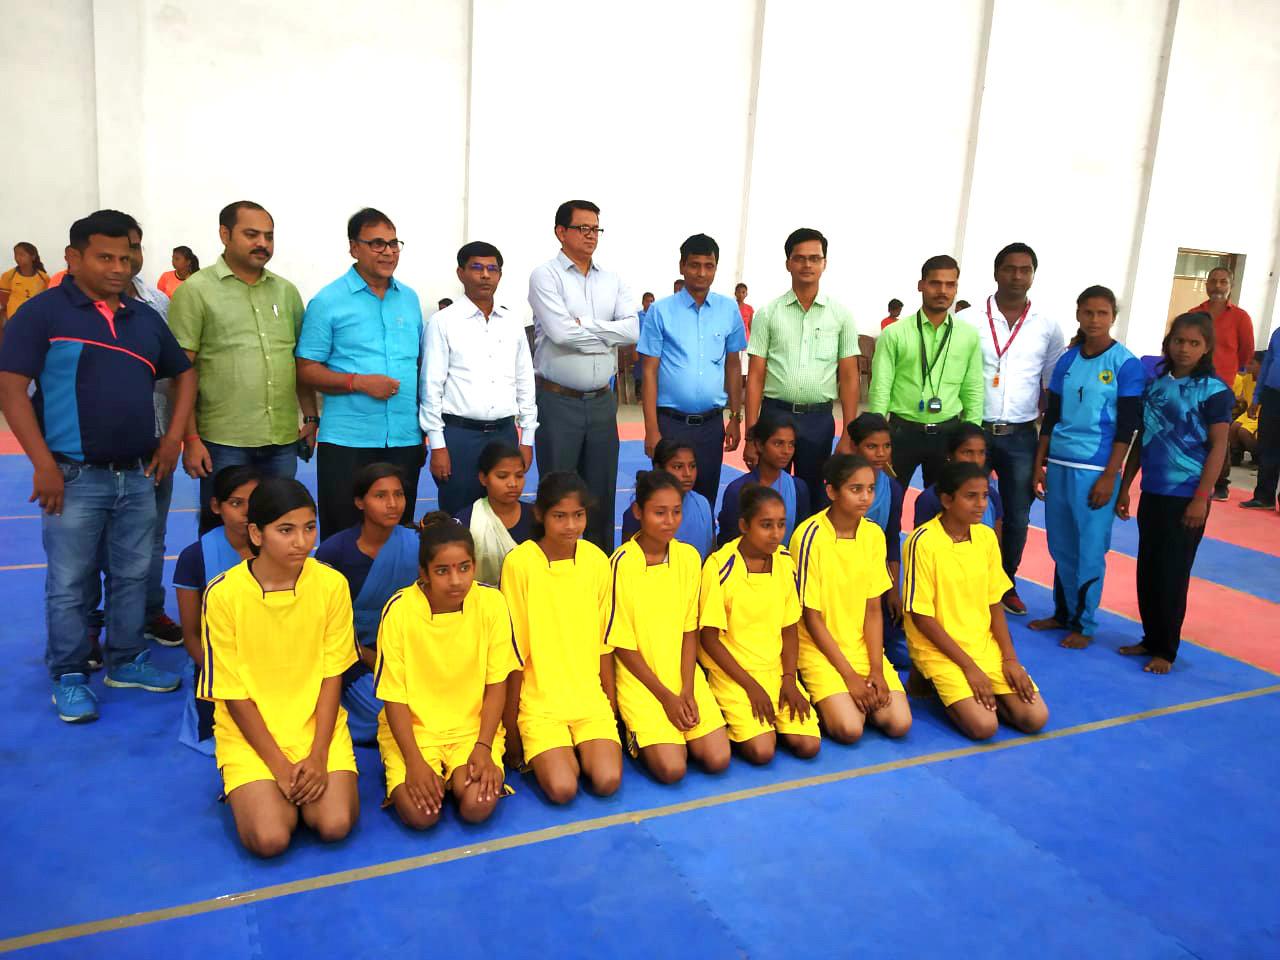 Dr.Madhepuri along with DDC Vinod Kumar Singh, ADM Upendra Kumar, NDC Rajneesh Kumar Roy, Arun Kumar & others with Balika Kabaddi Teams at B.P.Mandal Indoor Stadium on the occasion of Zila Athapana Diwas 2019.